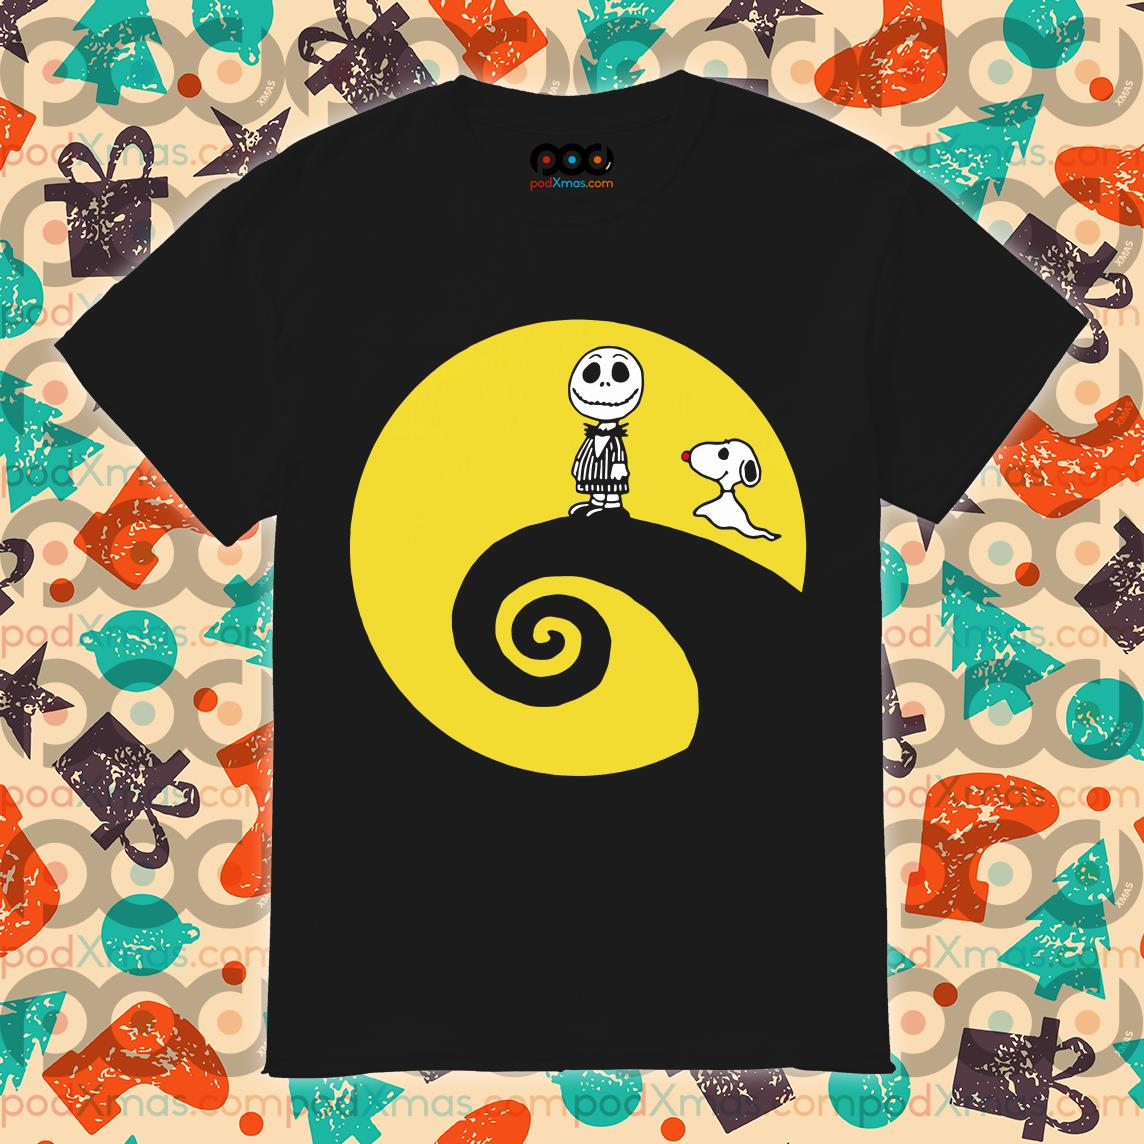 Jack Skellington Charlie Brown Snoopy The Nightmare Before Christmas Shirt